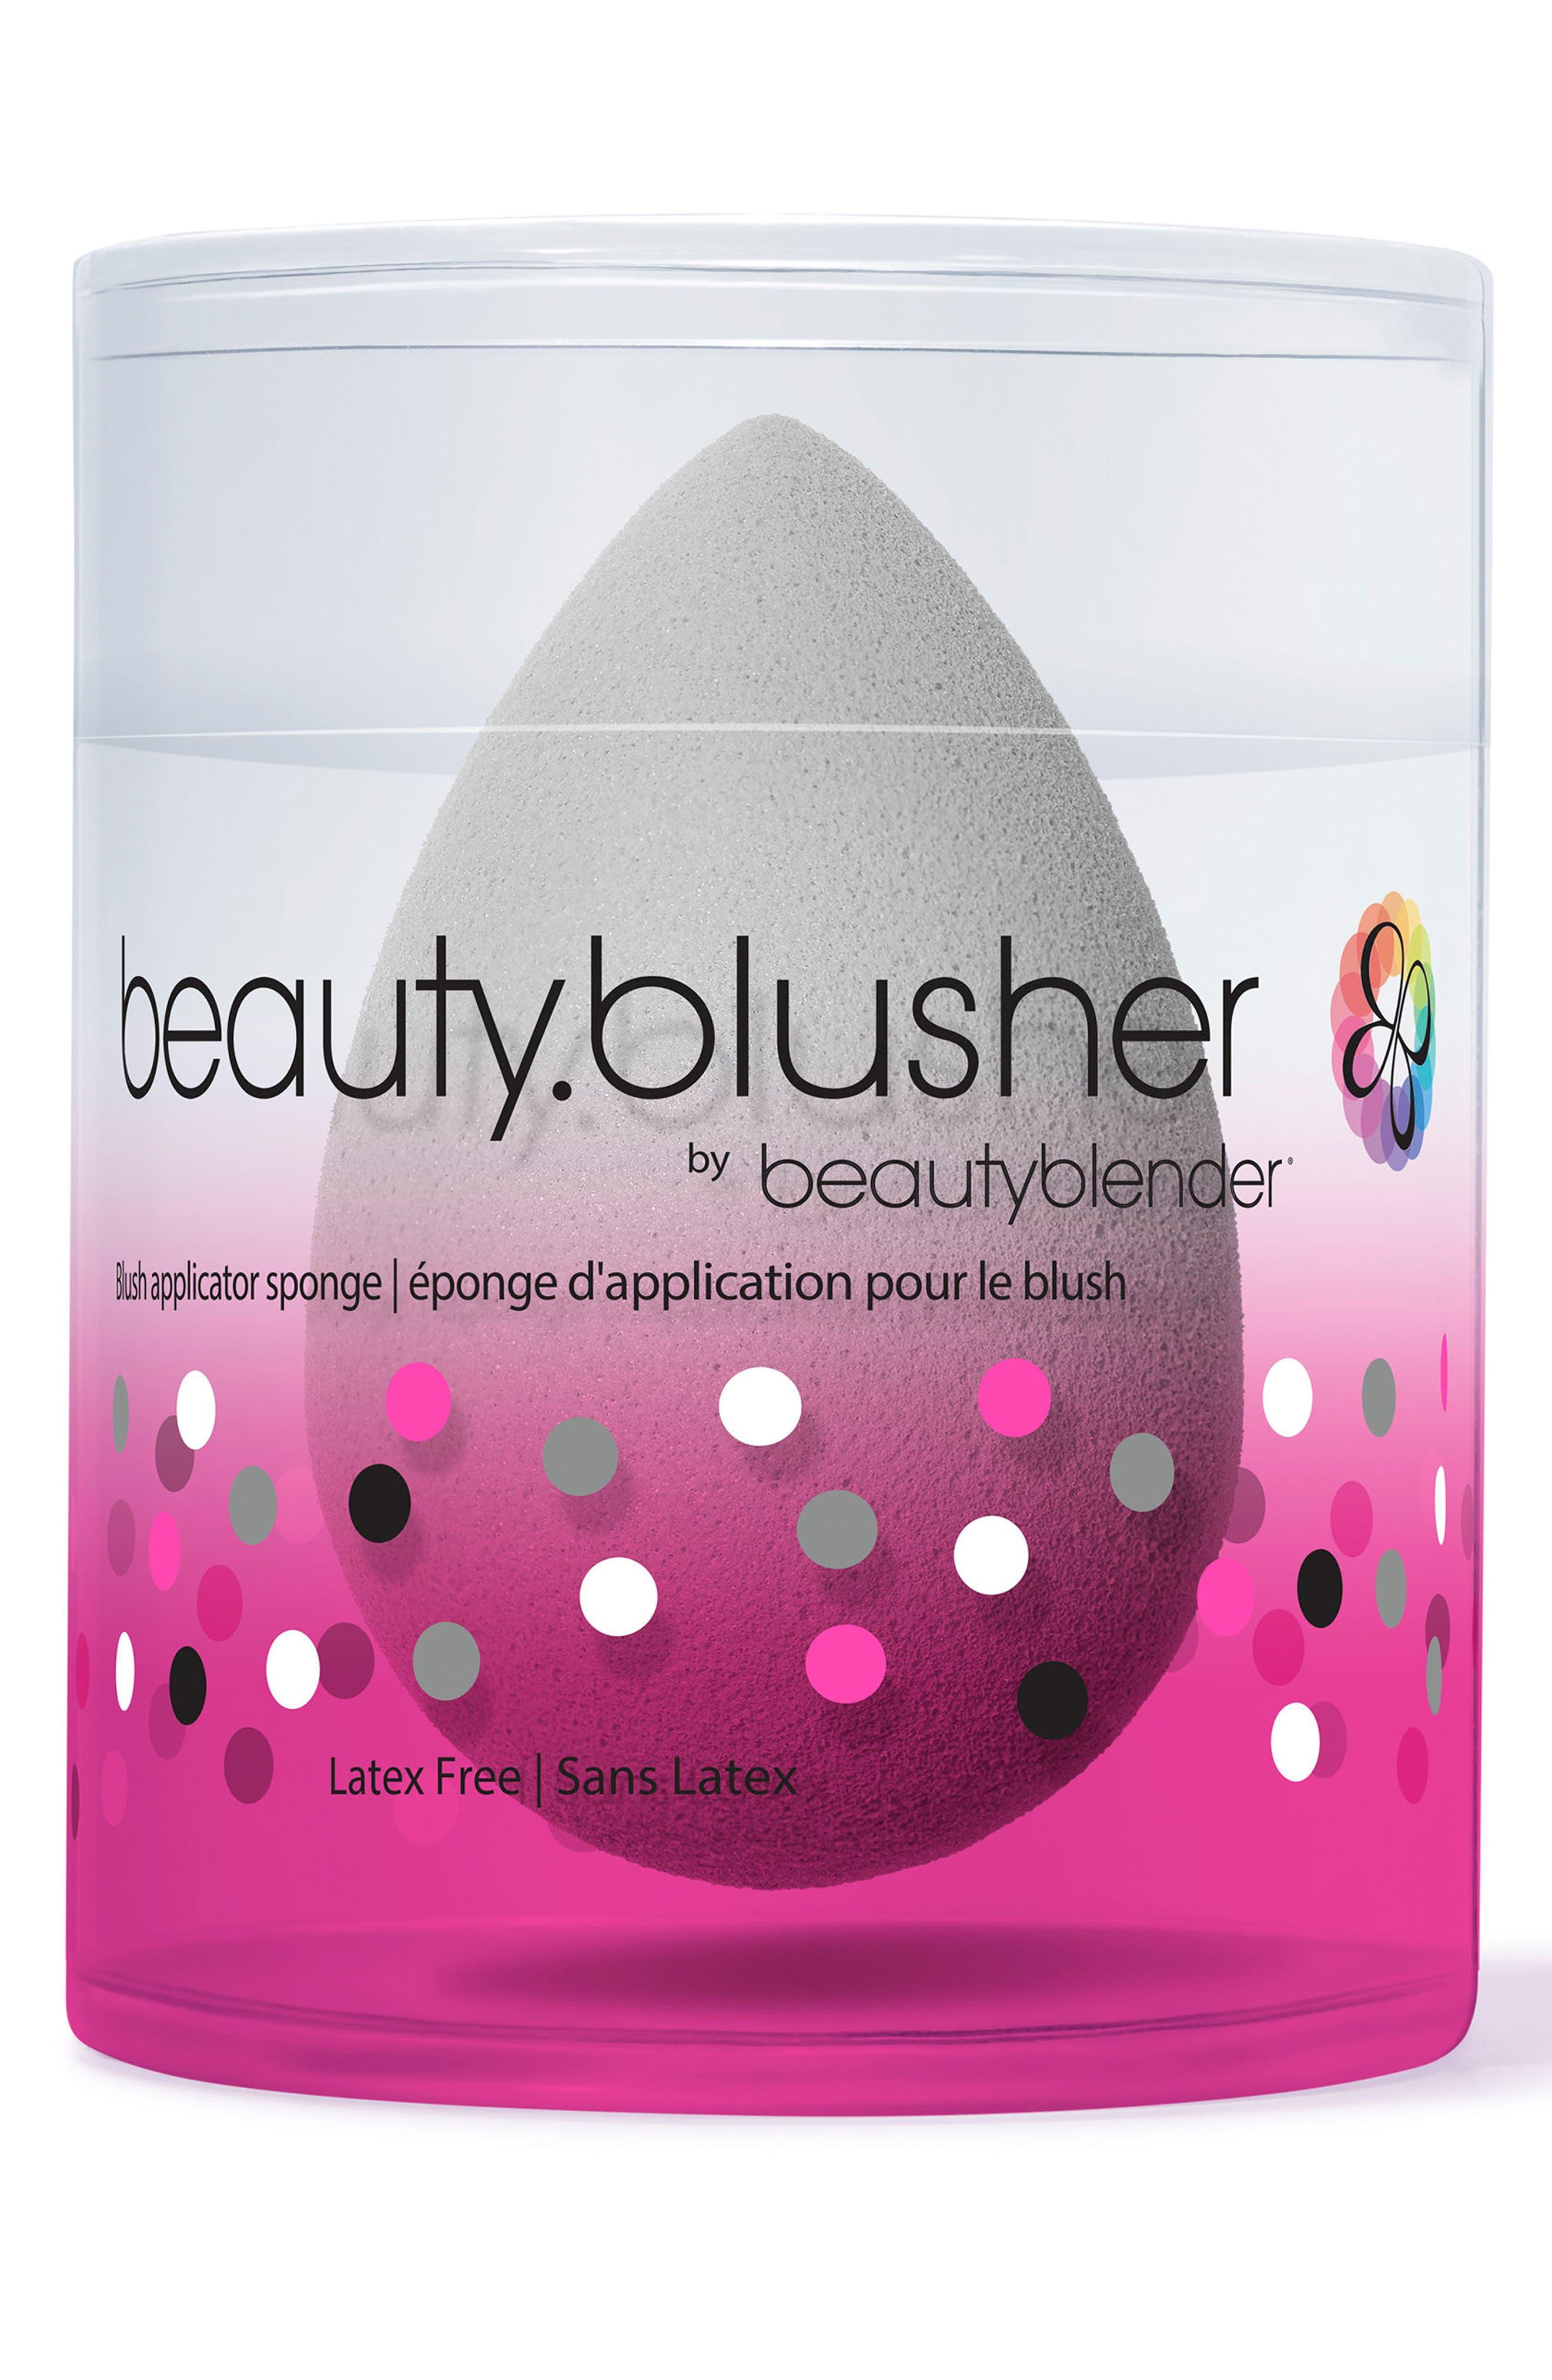 'beauty.blusher' Makeup Sponge Applicator,                             Alternate thumbnail 3, color,